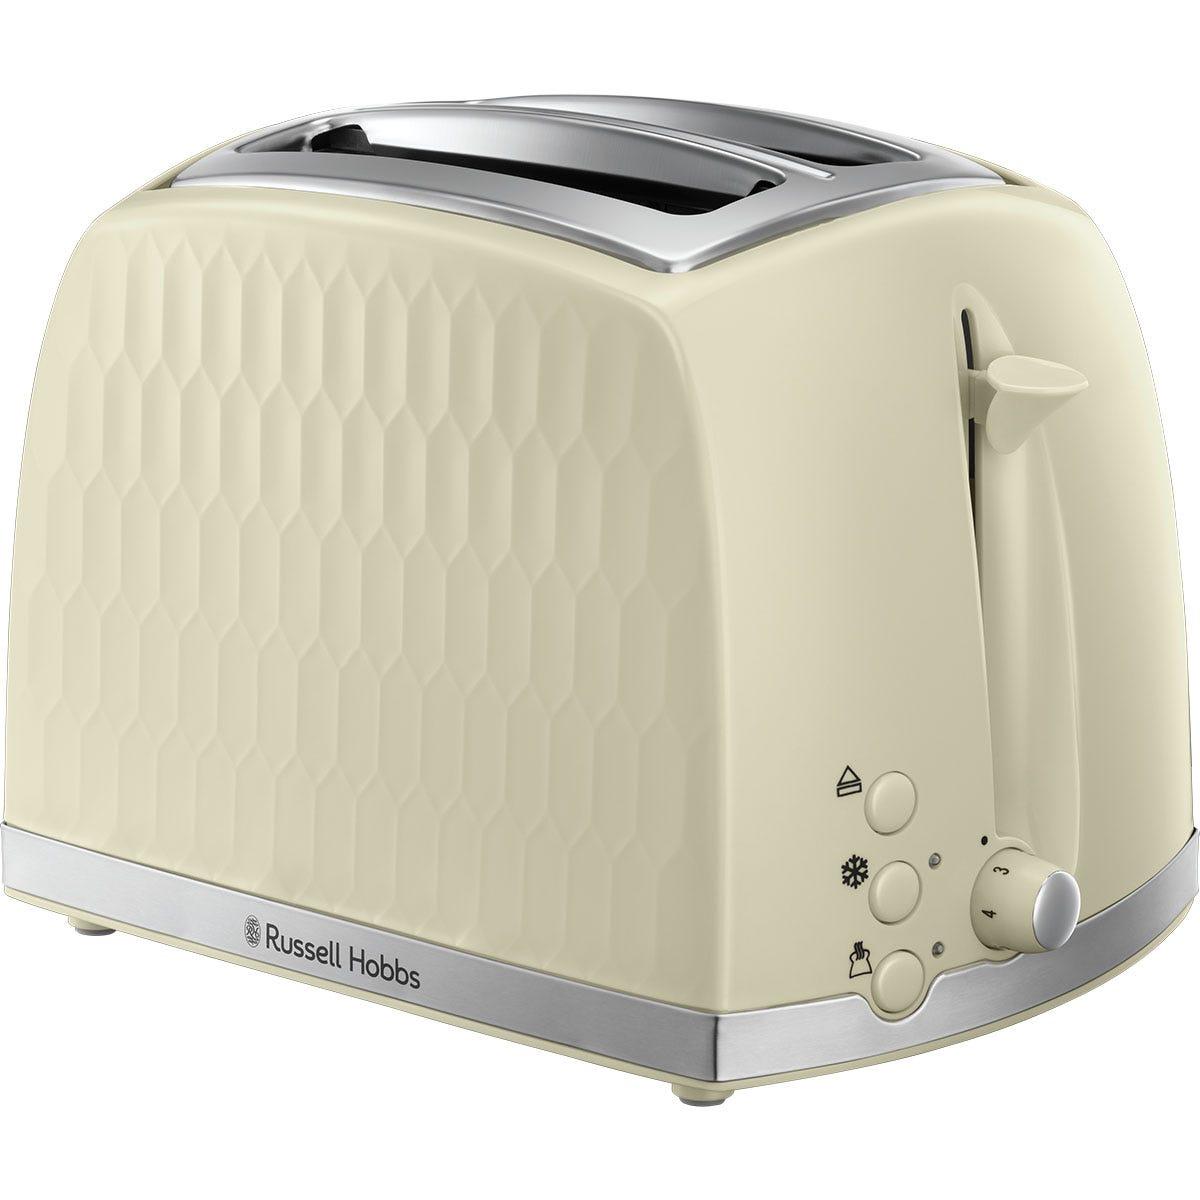 Russell Hobbs 26062 Honeycomb 2-Slice Toaster - Cream